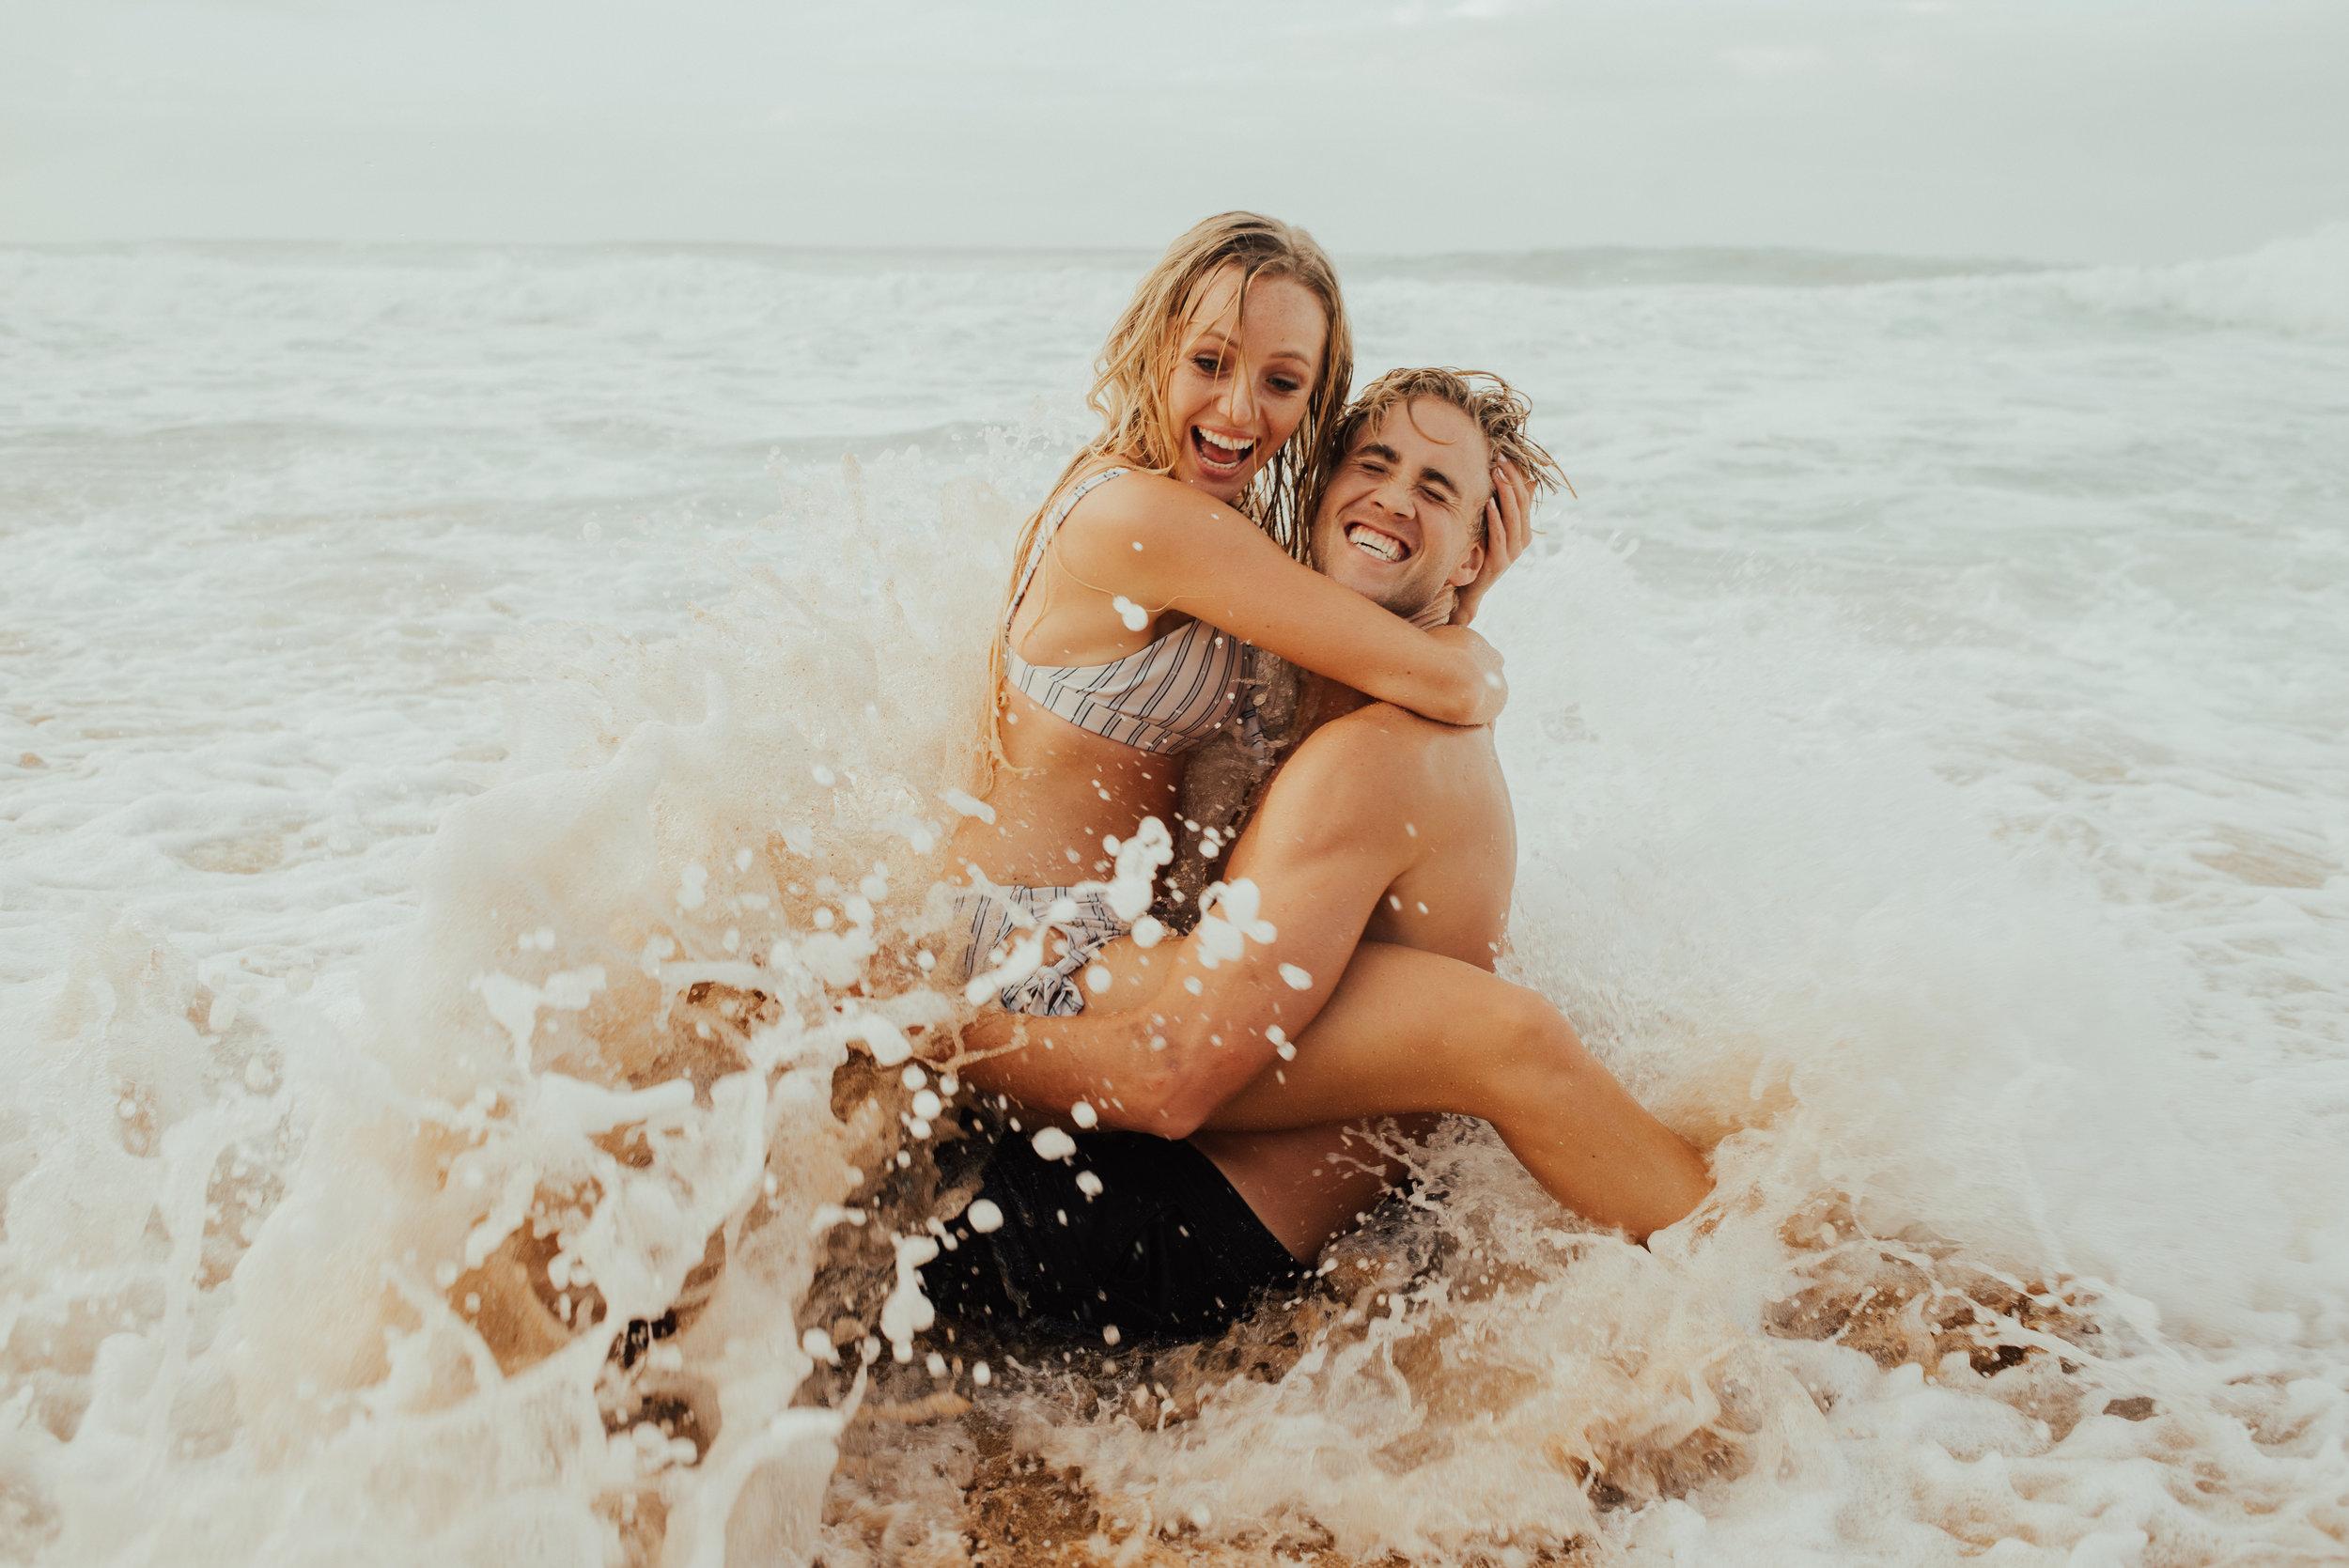 Kauai Secret beach surfing Couple Session by SB Photographs01101001000111001110110110100100100001101001DSC_9382DSC_93820001101.jpg